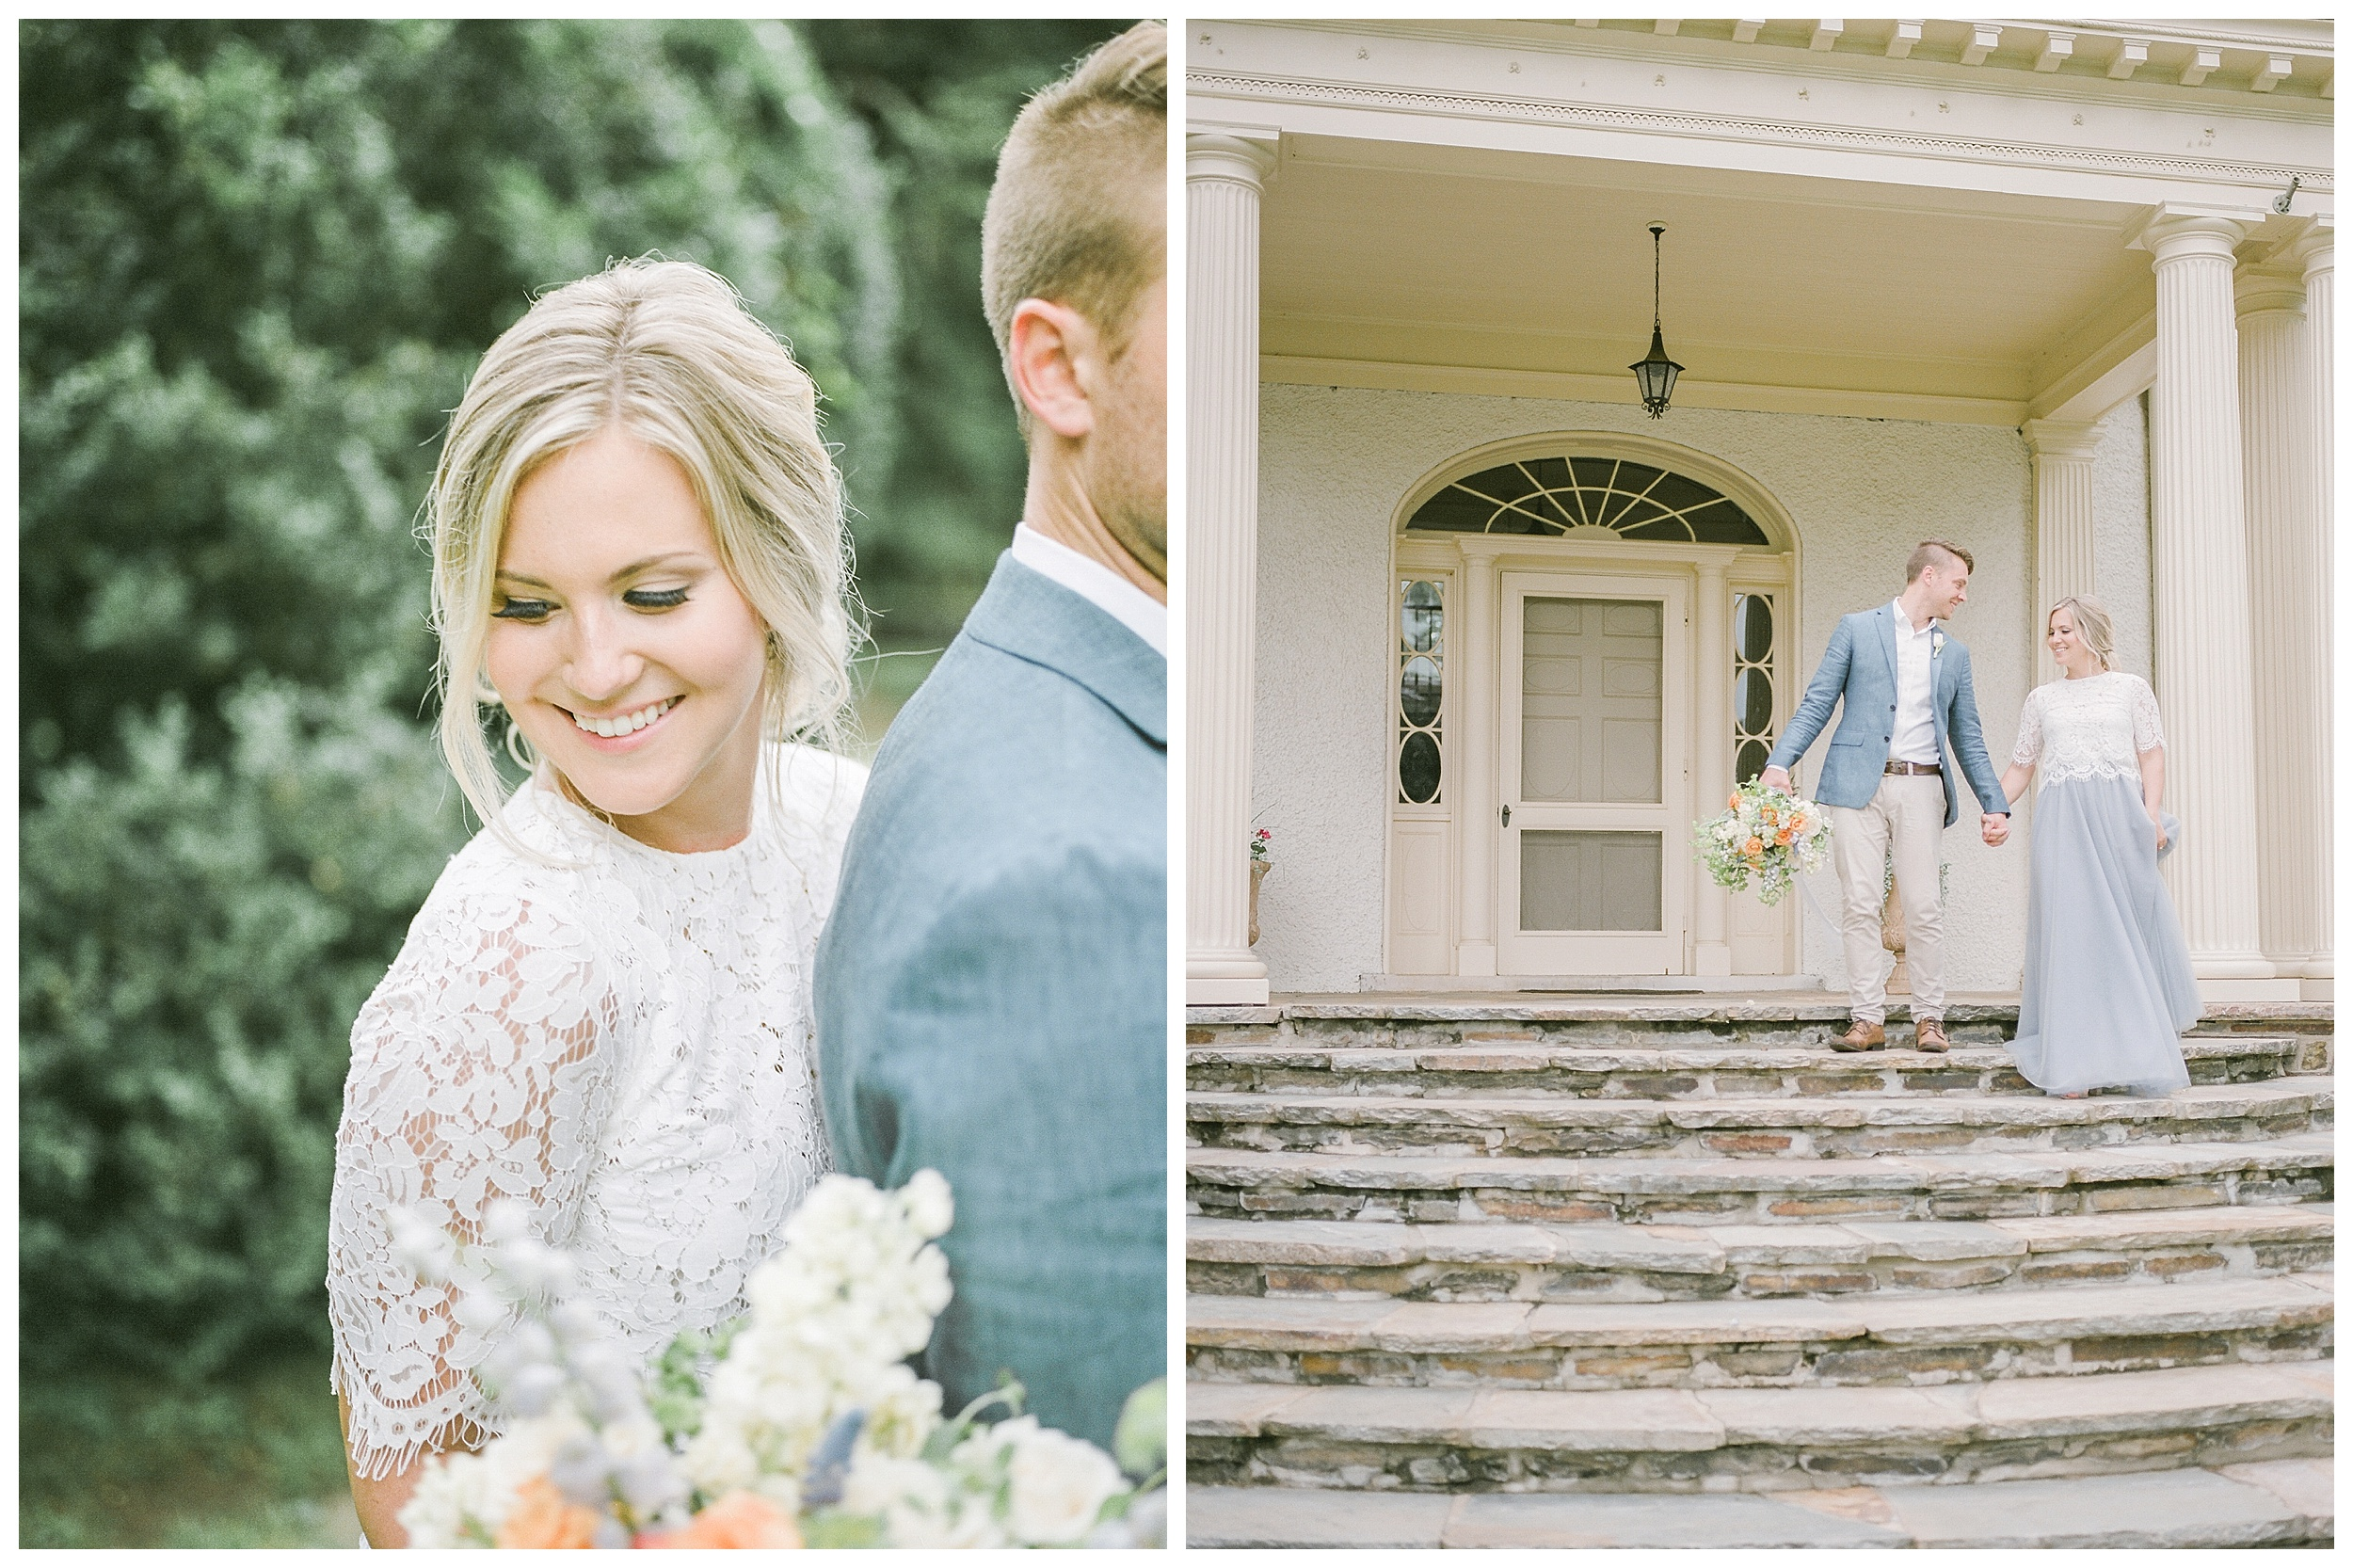 Rust Manor Wedding   Virginia Wedding Photographer Kir Tuben_0012.jpg